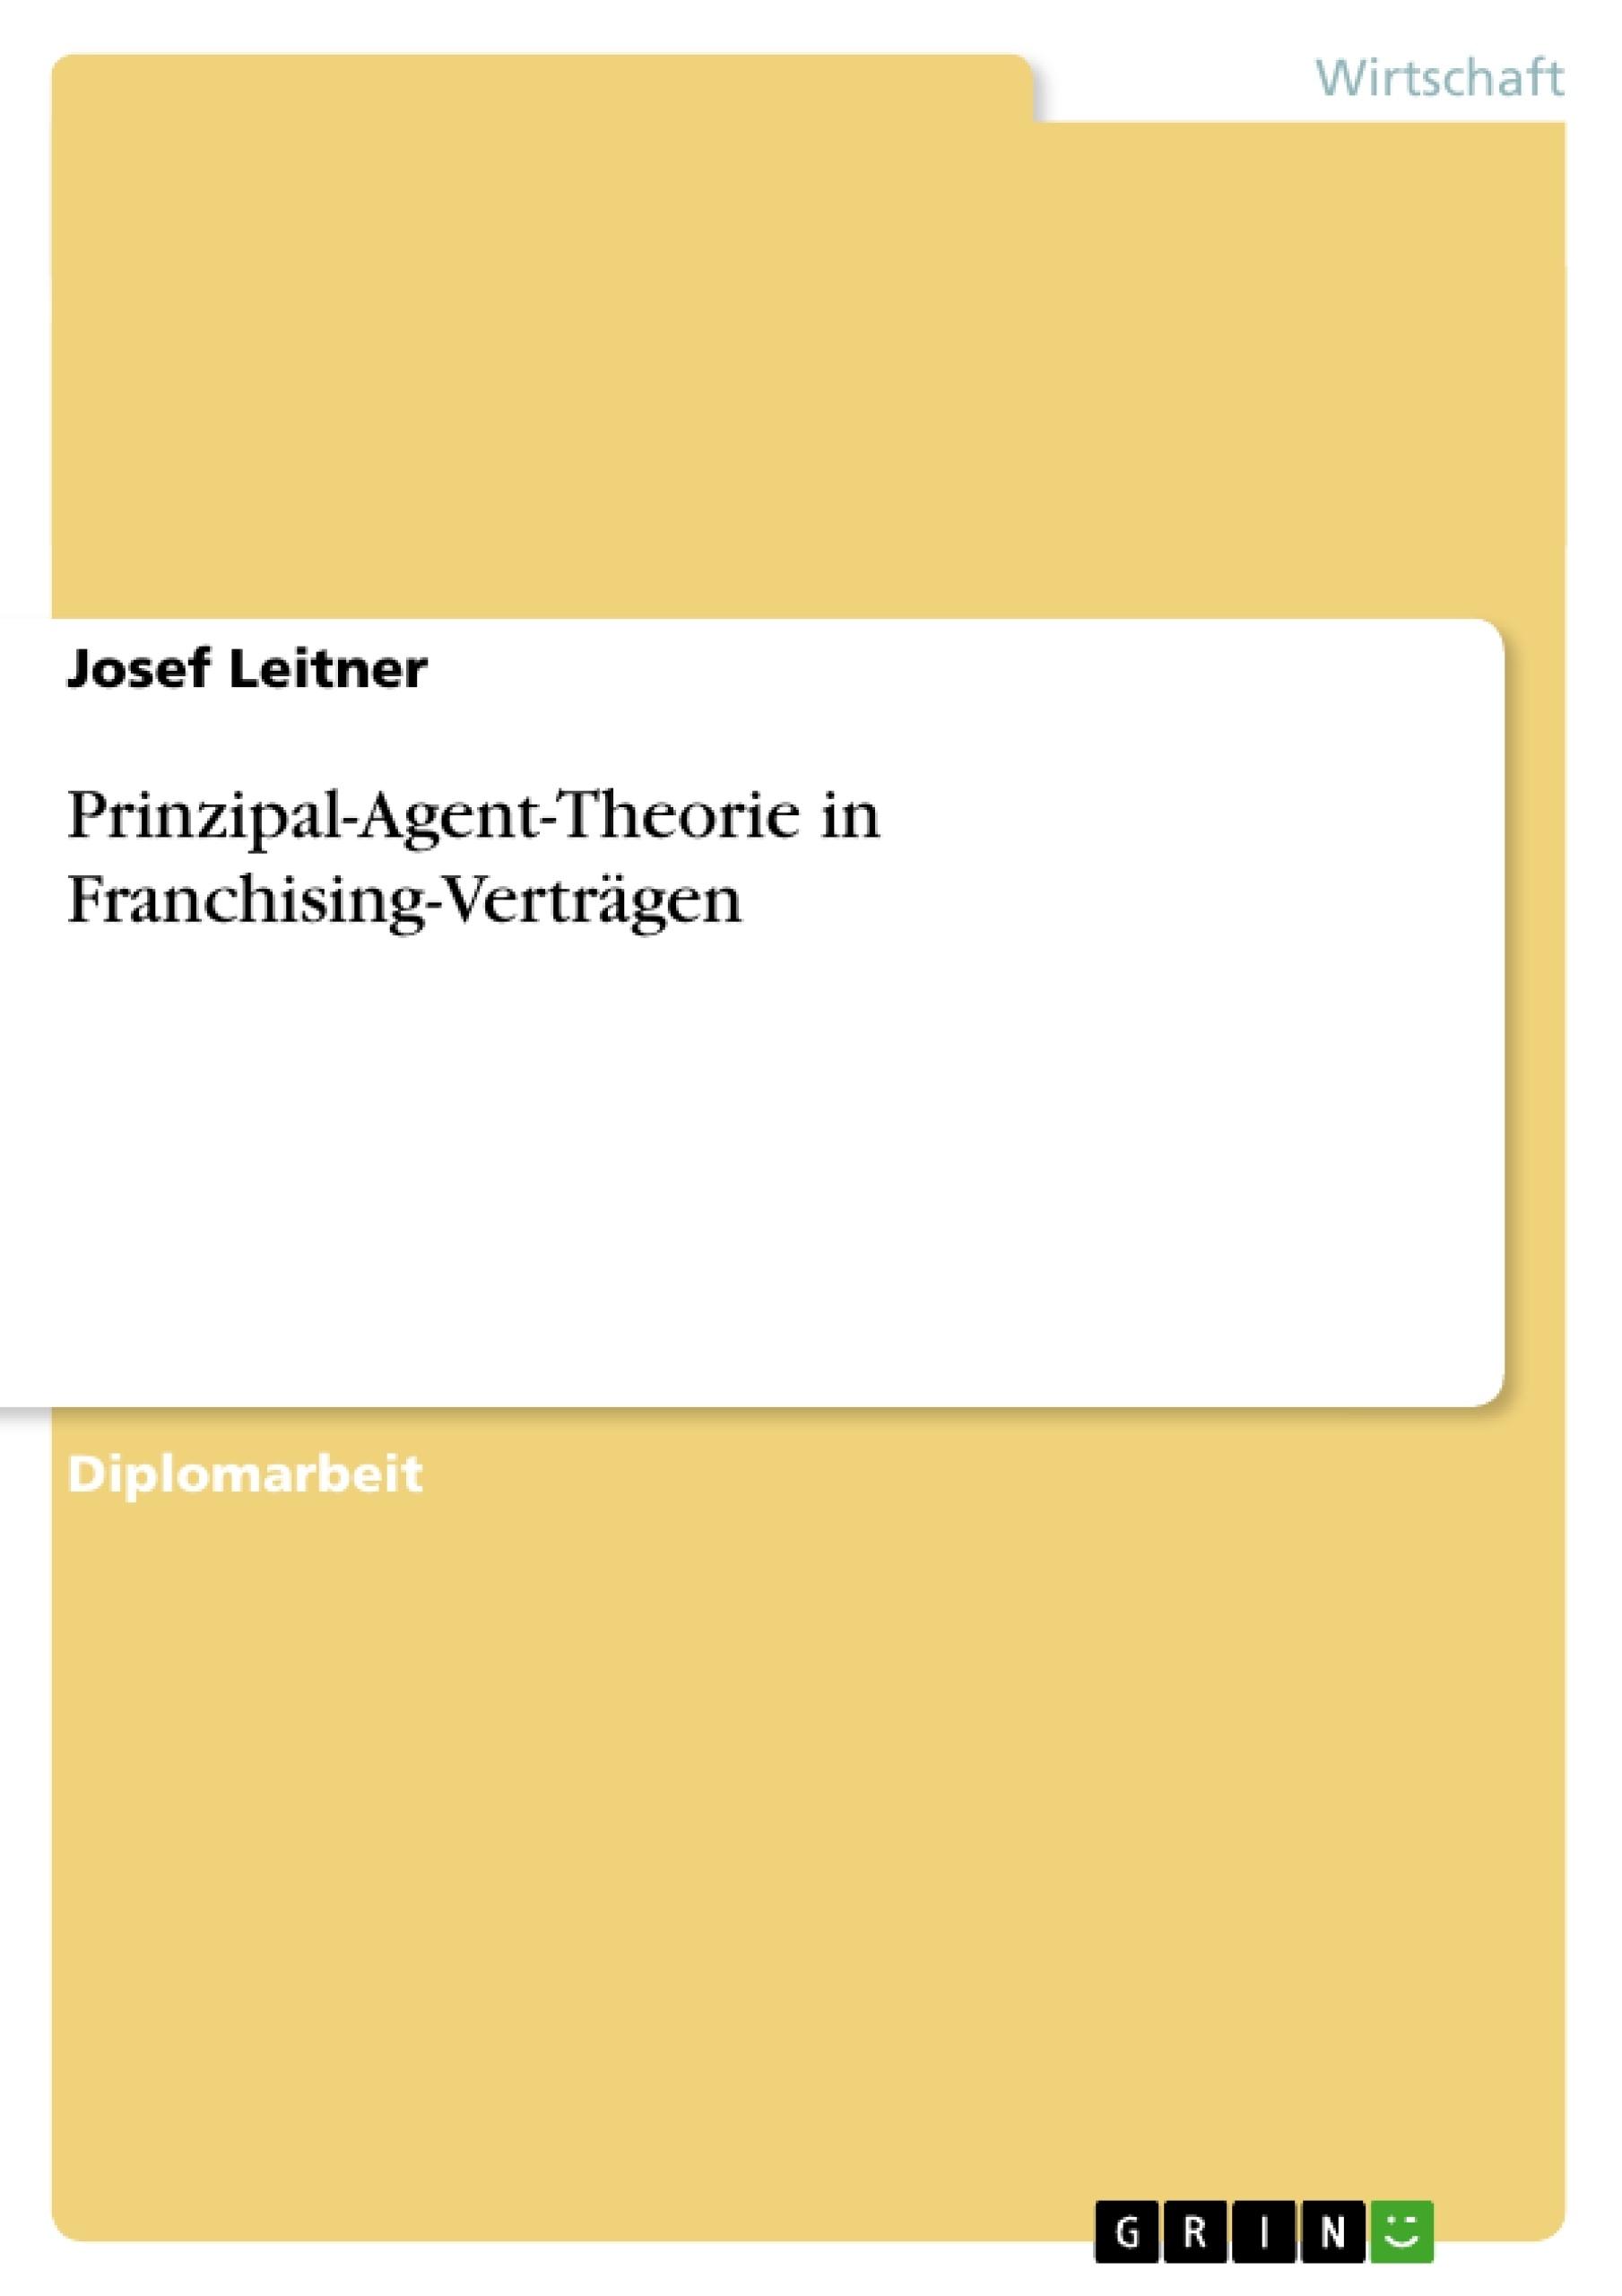 Titel: Prinzipal-Agent-Theorie in Franchising-Verträgen